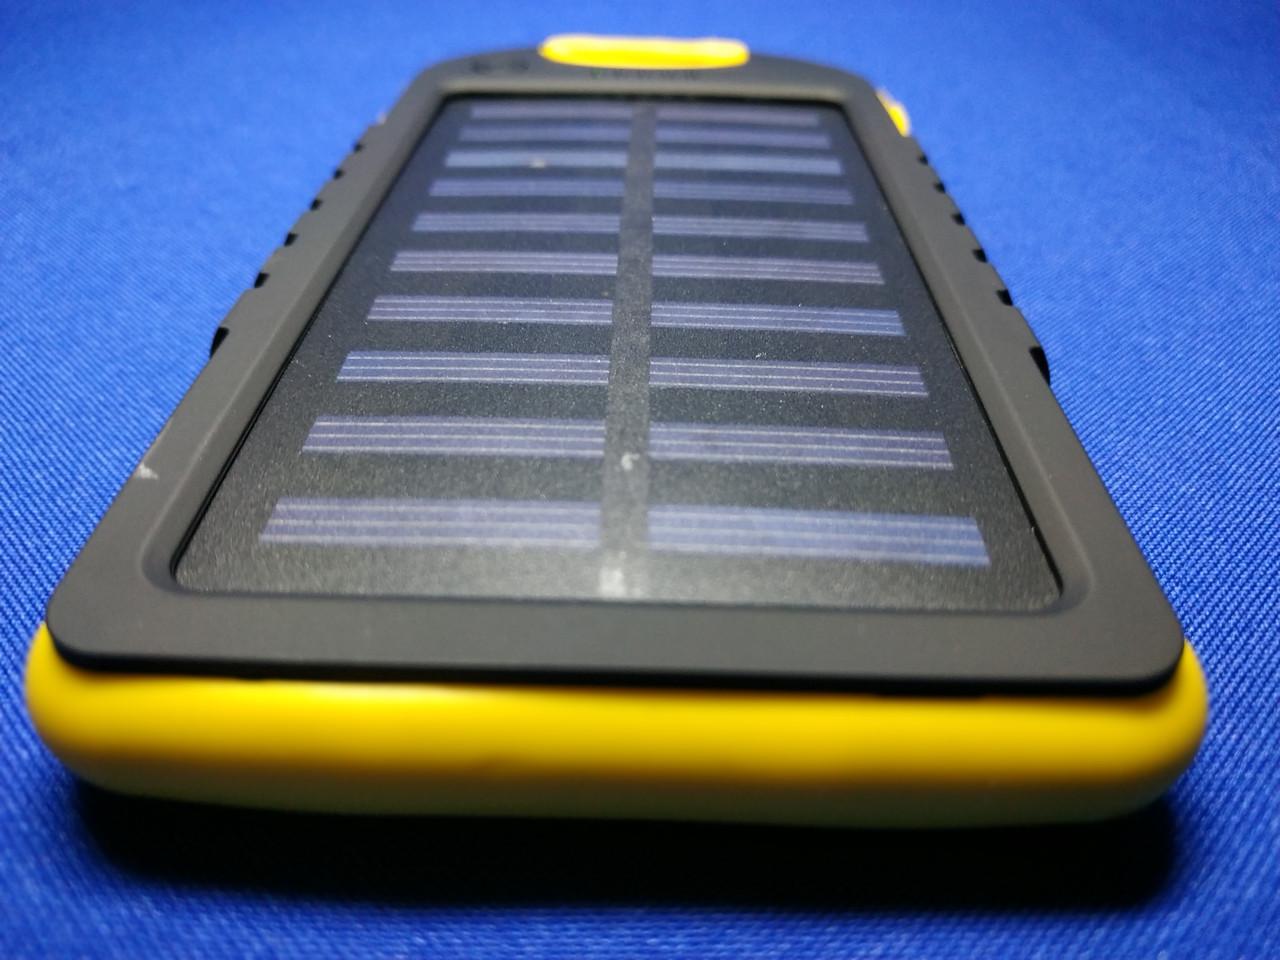 Power Bank Solar 10000mA на солнечных батареях с фонариком (желтый)